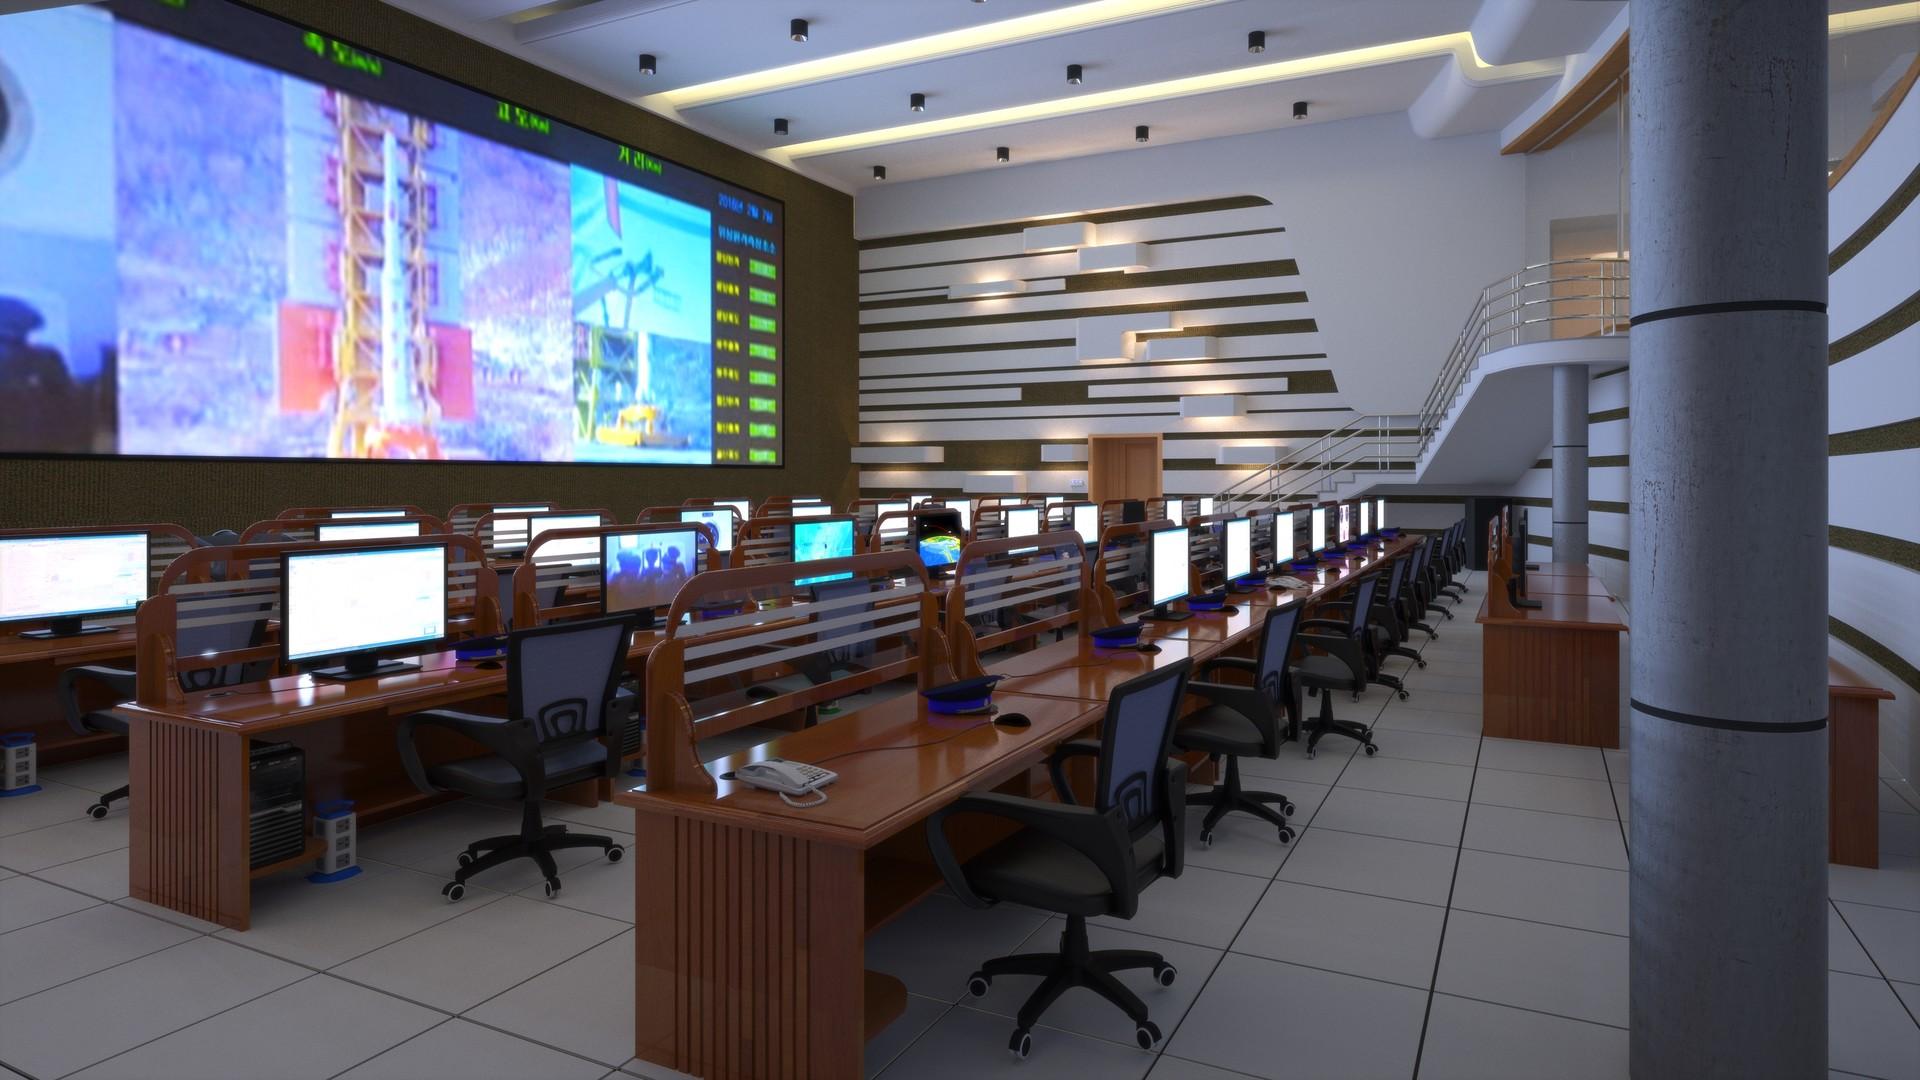 Duane kemp 15 control center floor dk 01 a